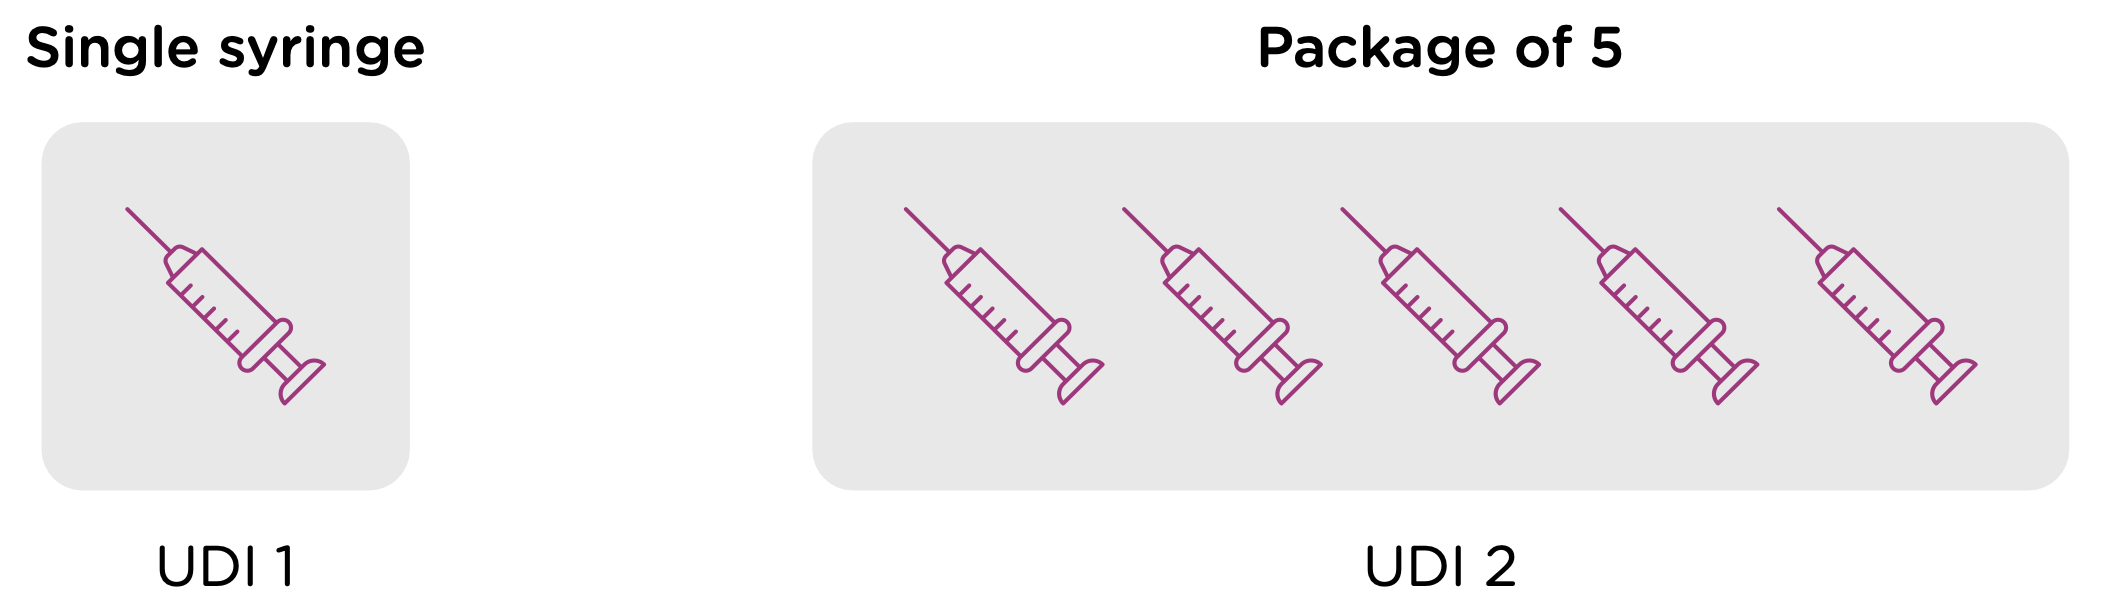 Packaging Example - Oral Syringe